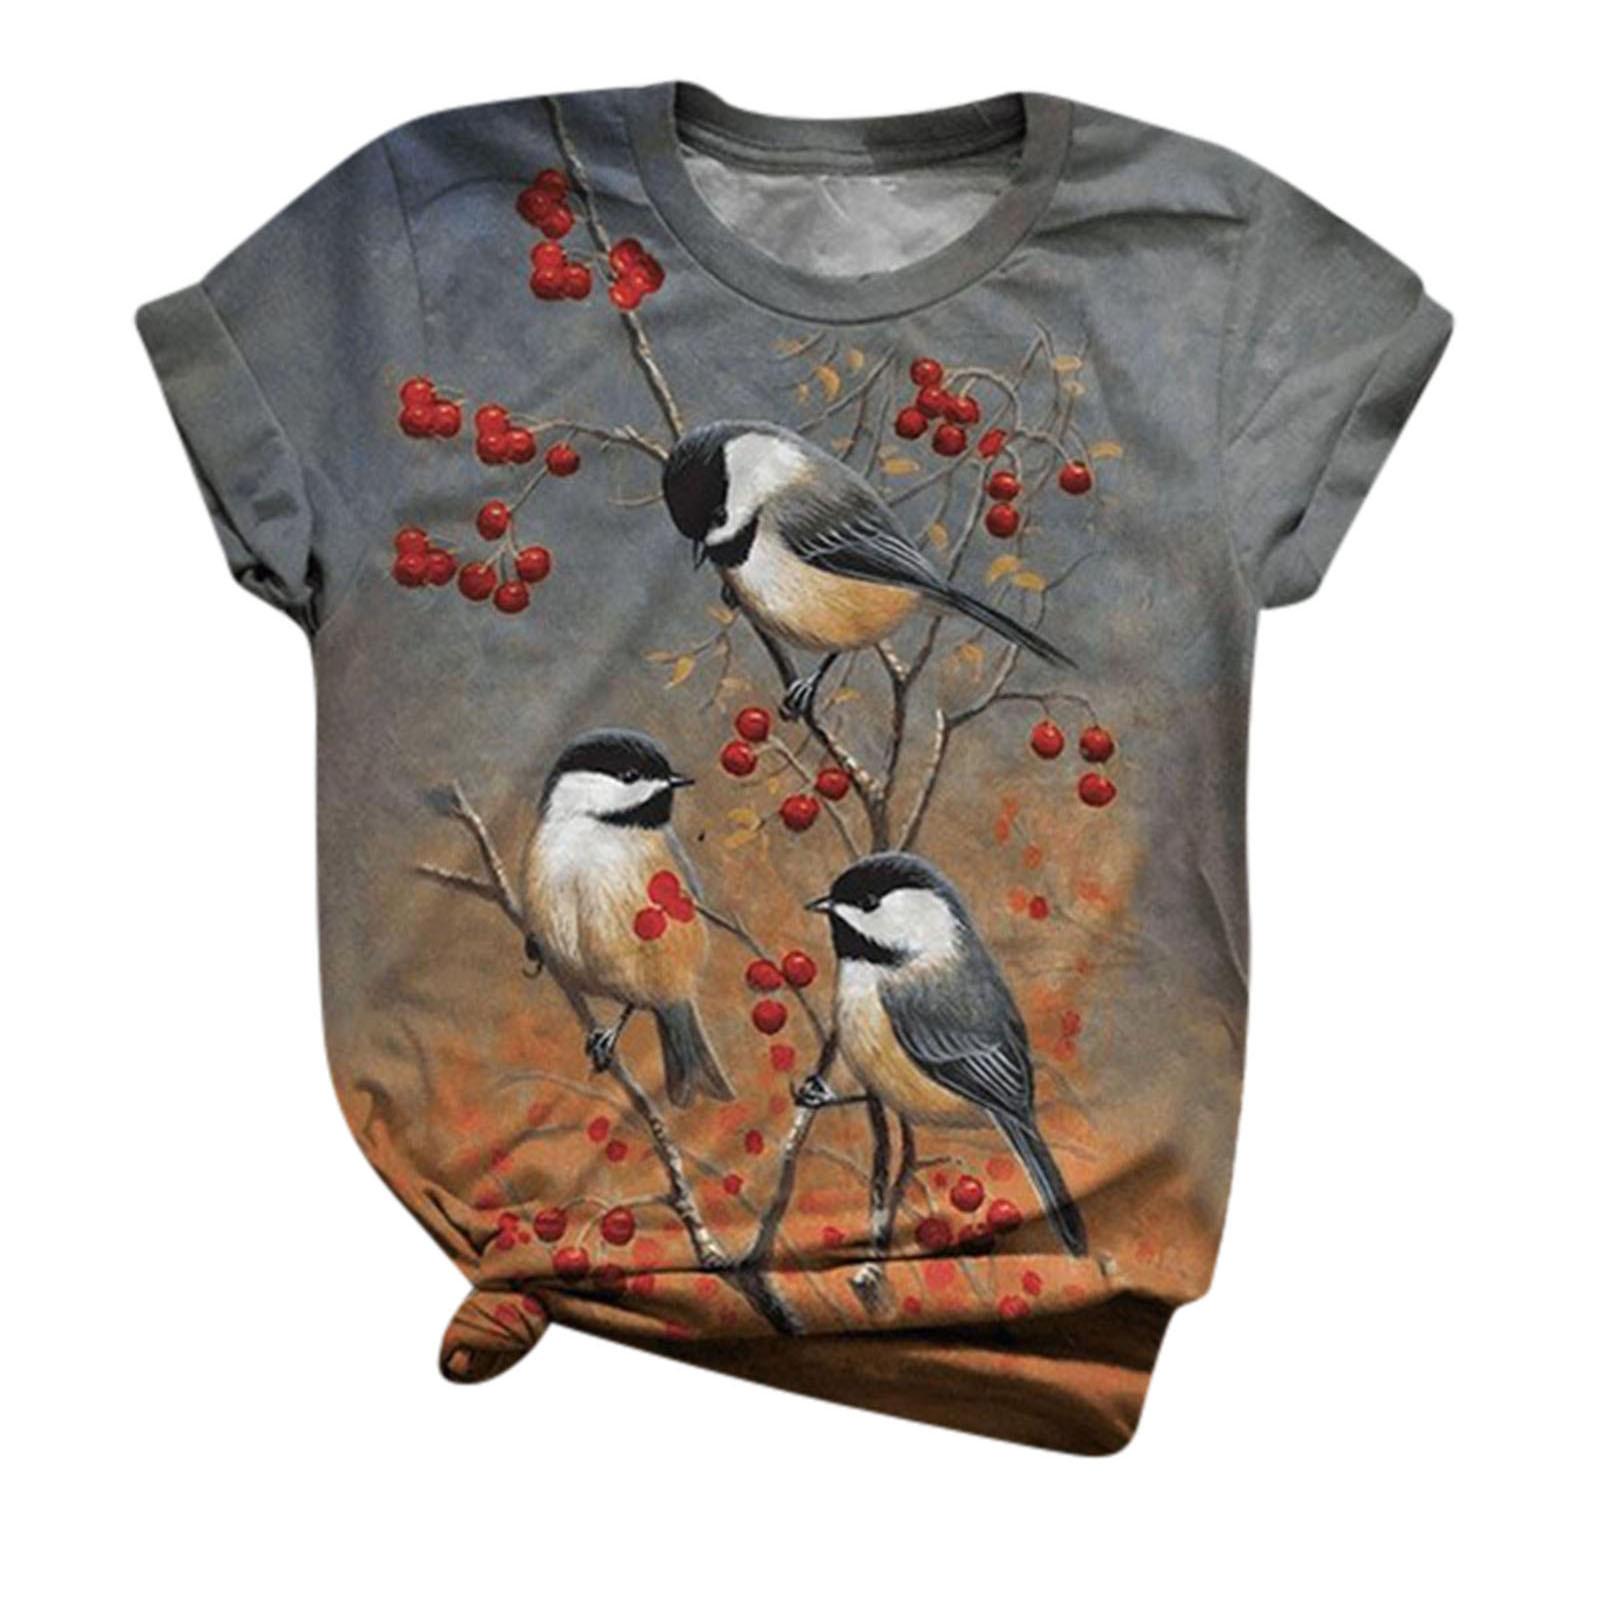 Womens Fun Animal Graphic Tees Plus Size 5XL Casual Short Sleeve Summer Cute Birds Printed T Shirt Tops женская футболка 5 xl A2